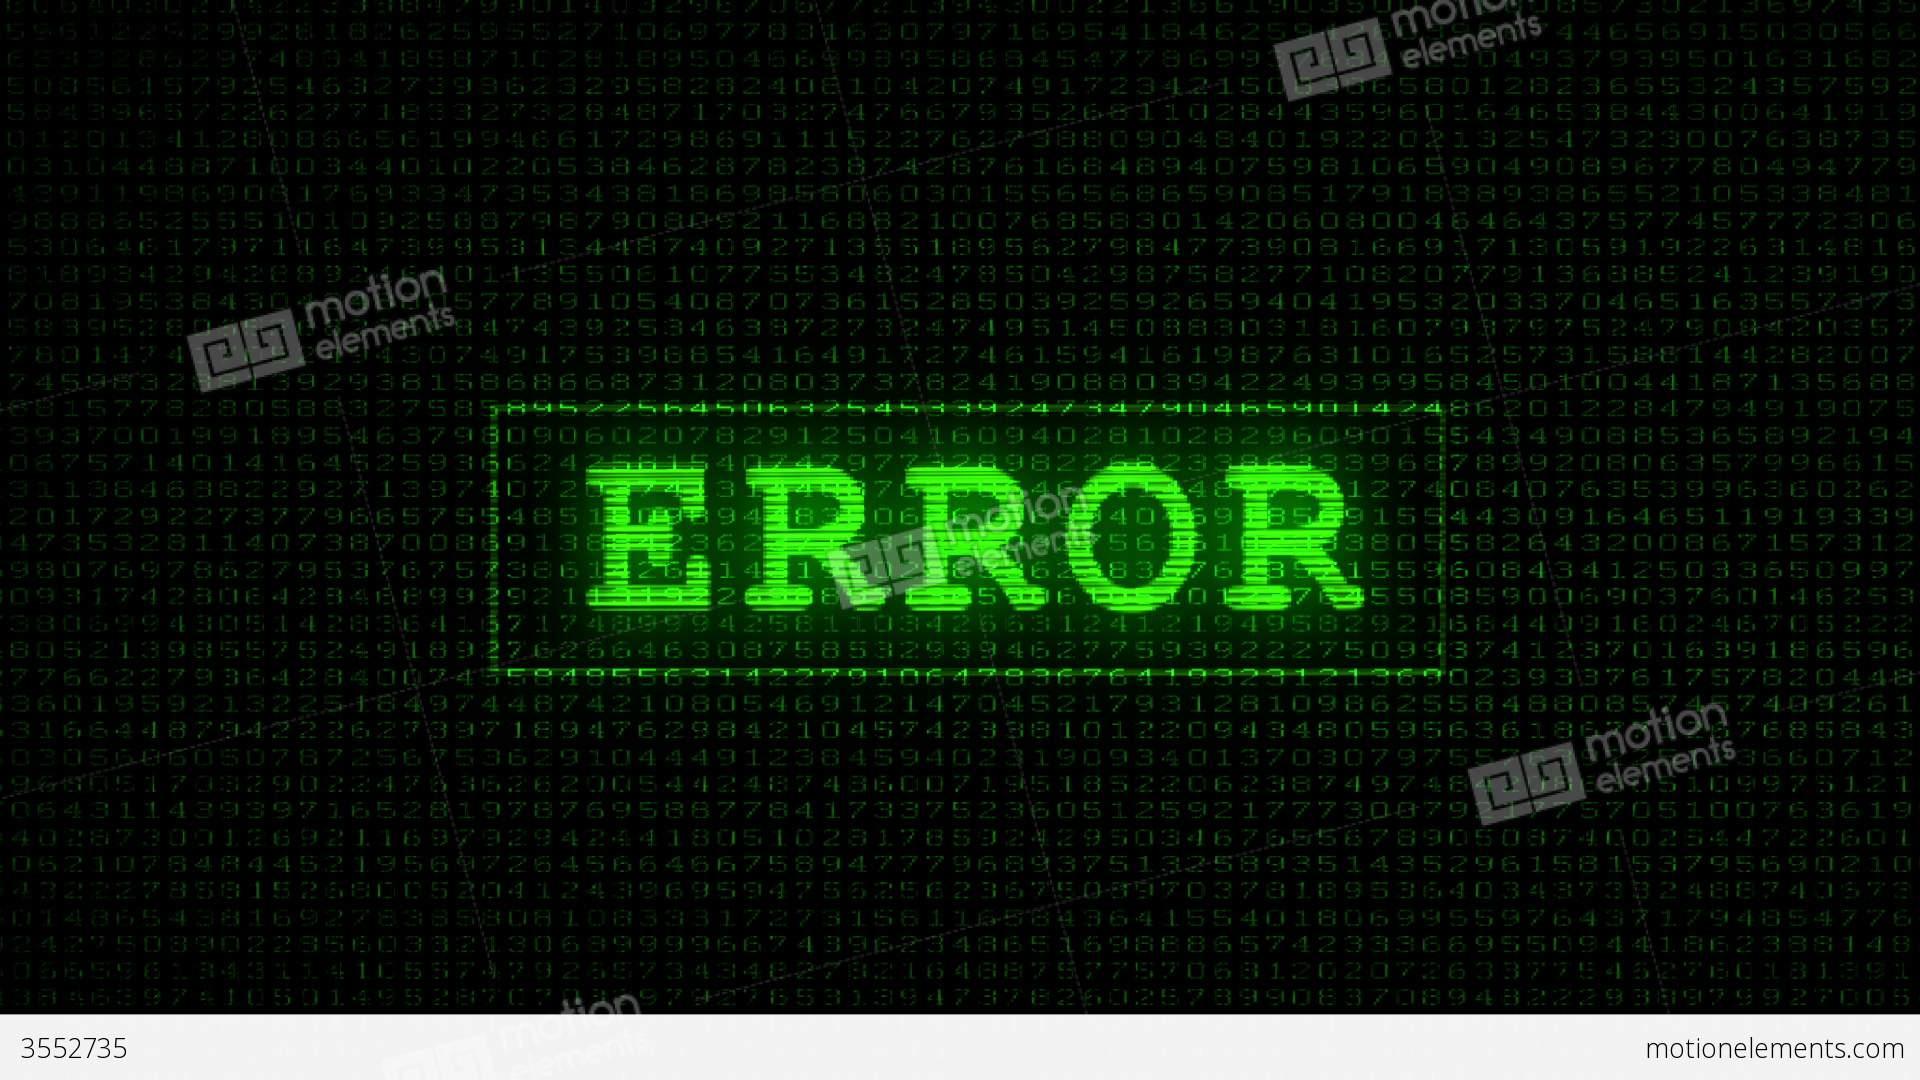 Money Wallpaper Hd Error Text Digital Data Code Matrix Stock Animation